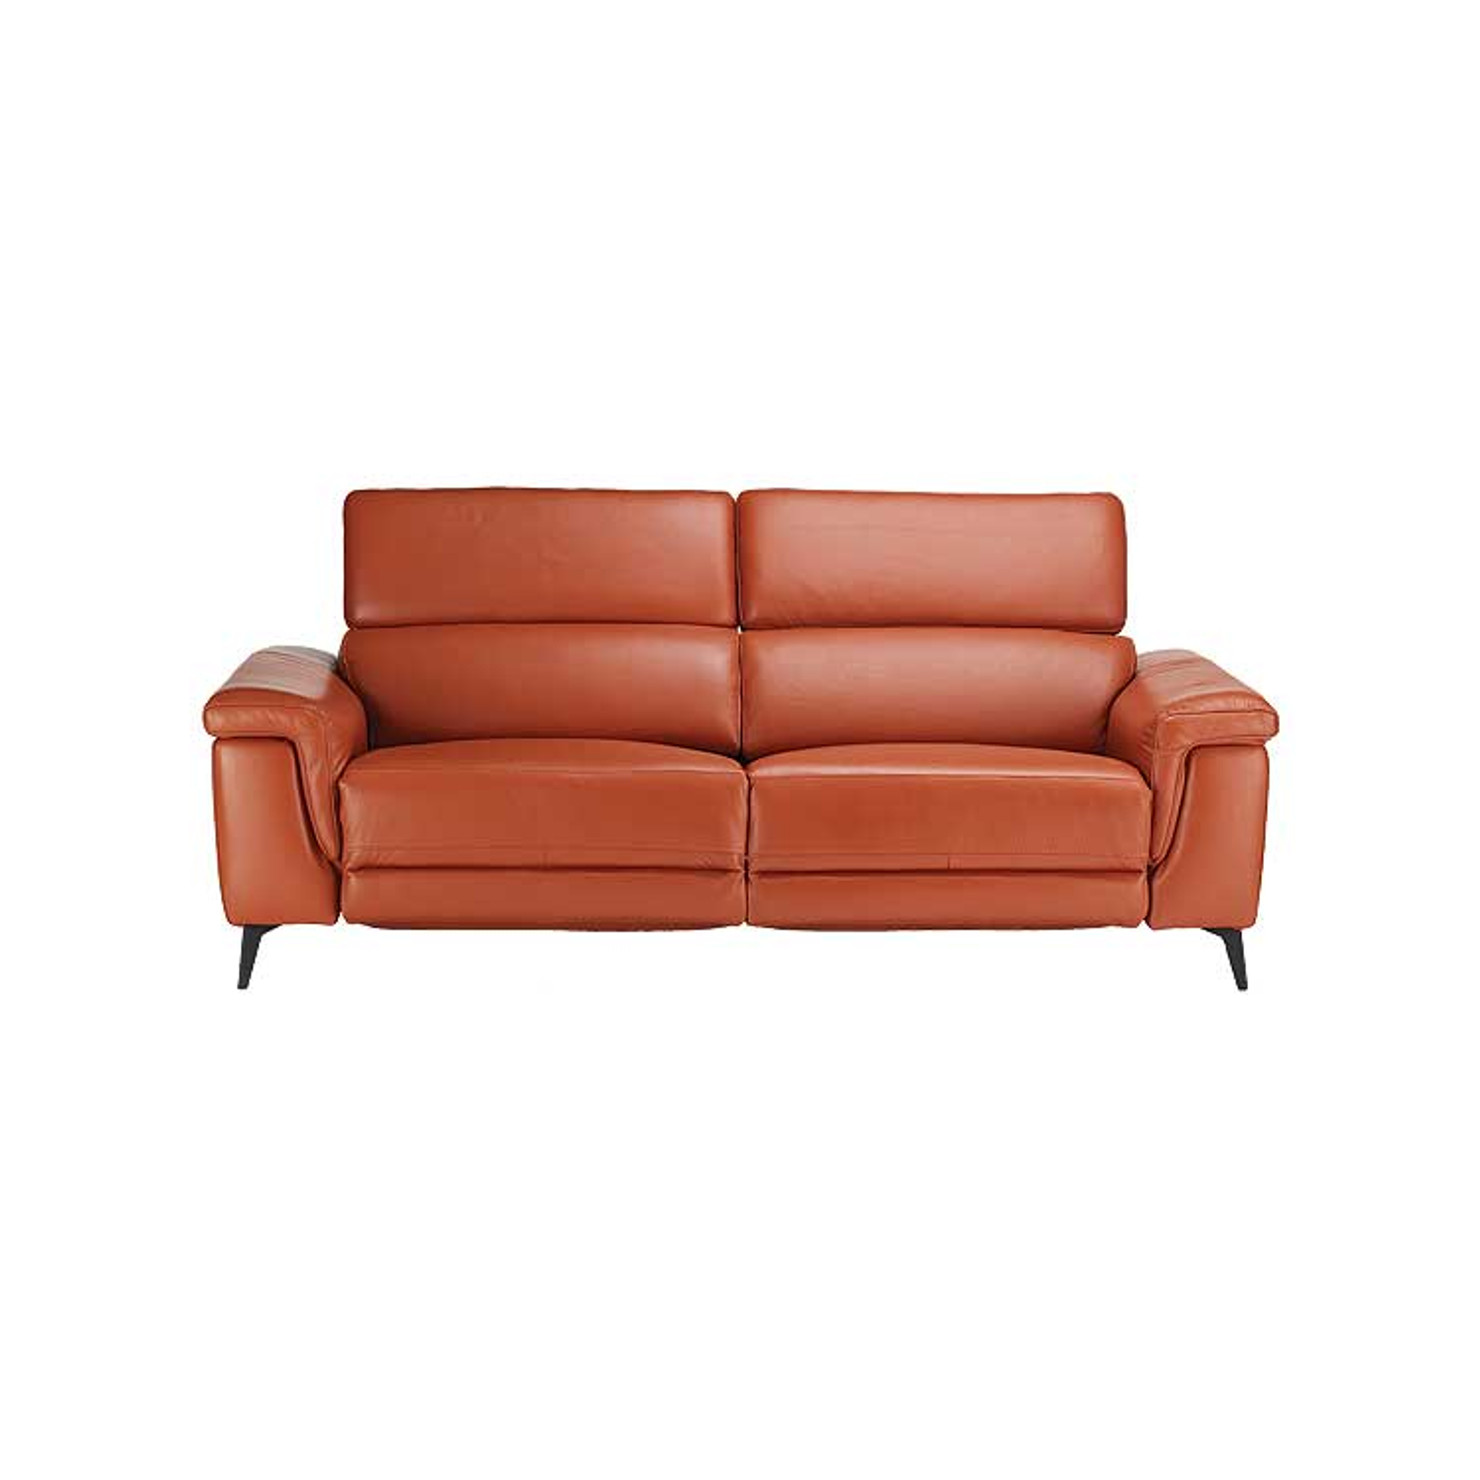 Wondrous Bergamo Motion Sofa Pabps2019 Chair Design Images Pabps2019Com